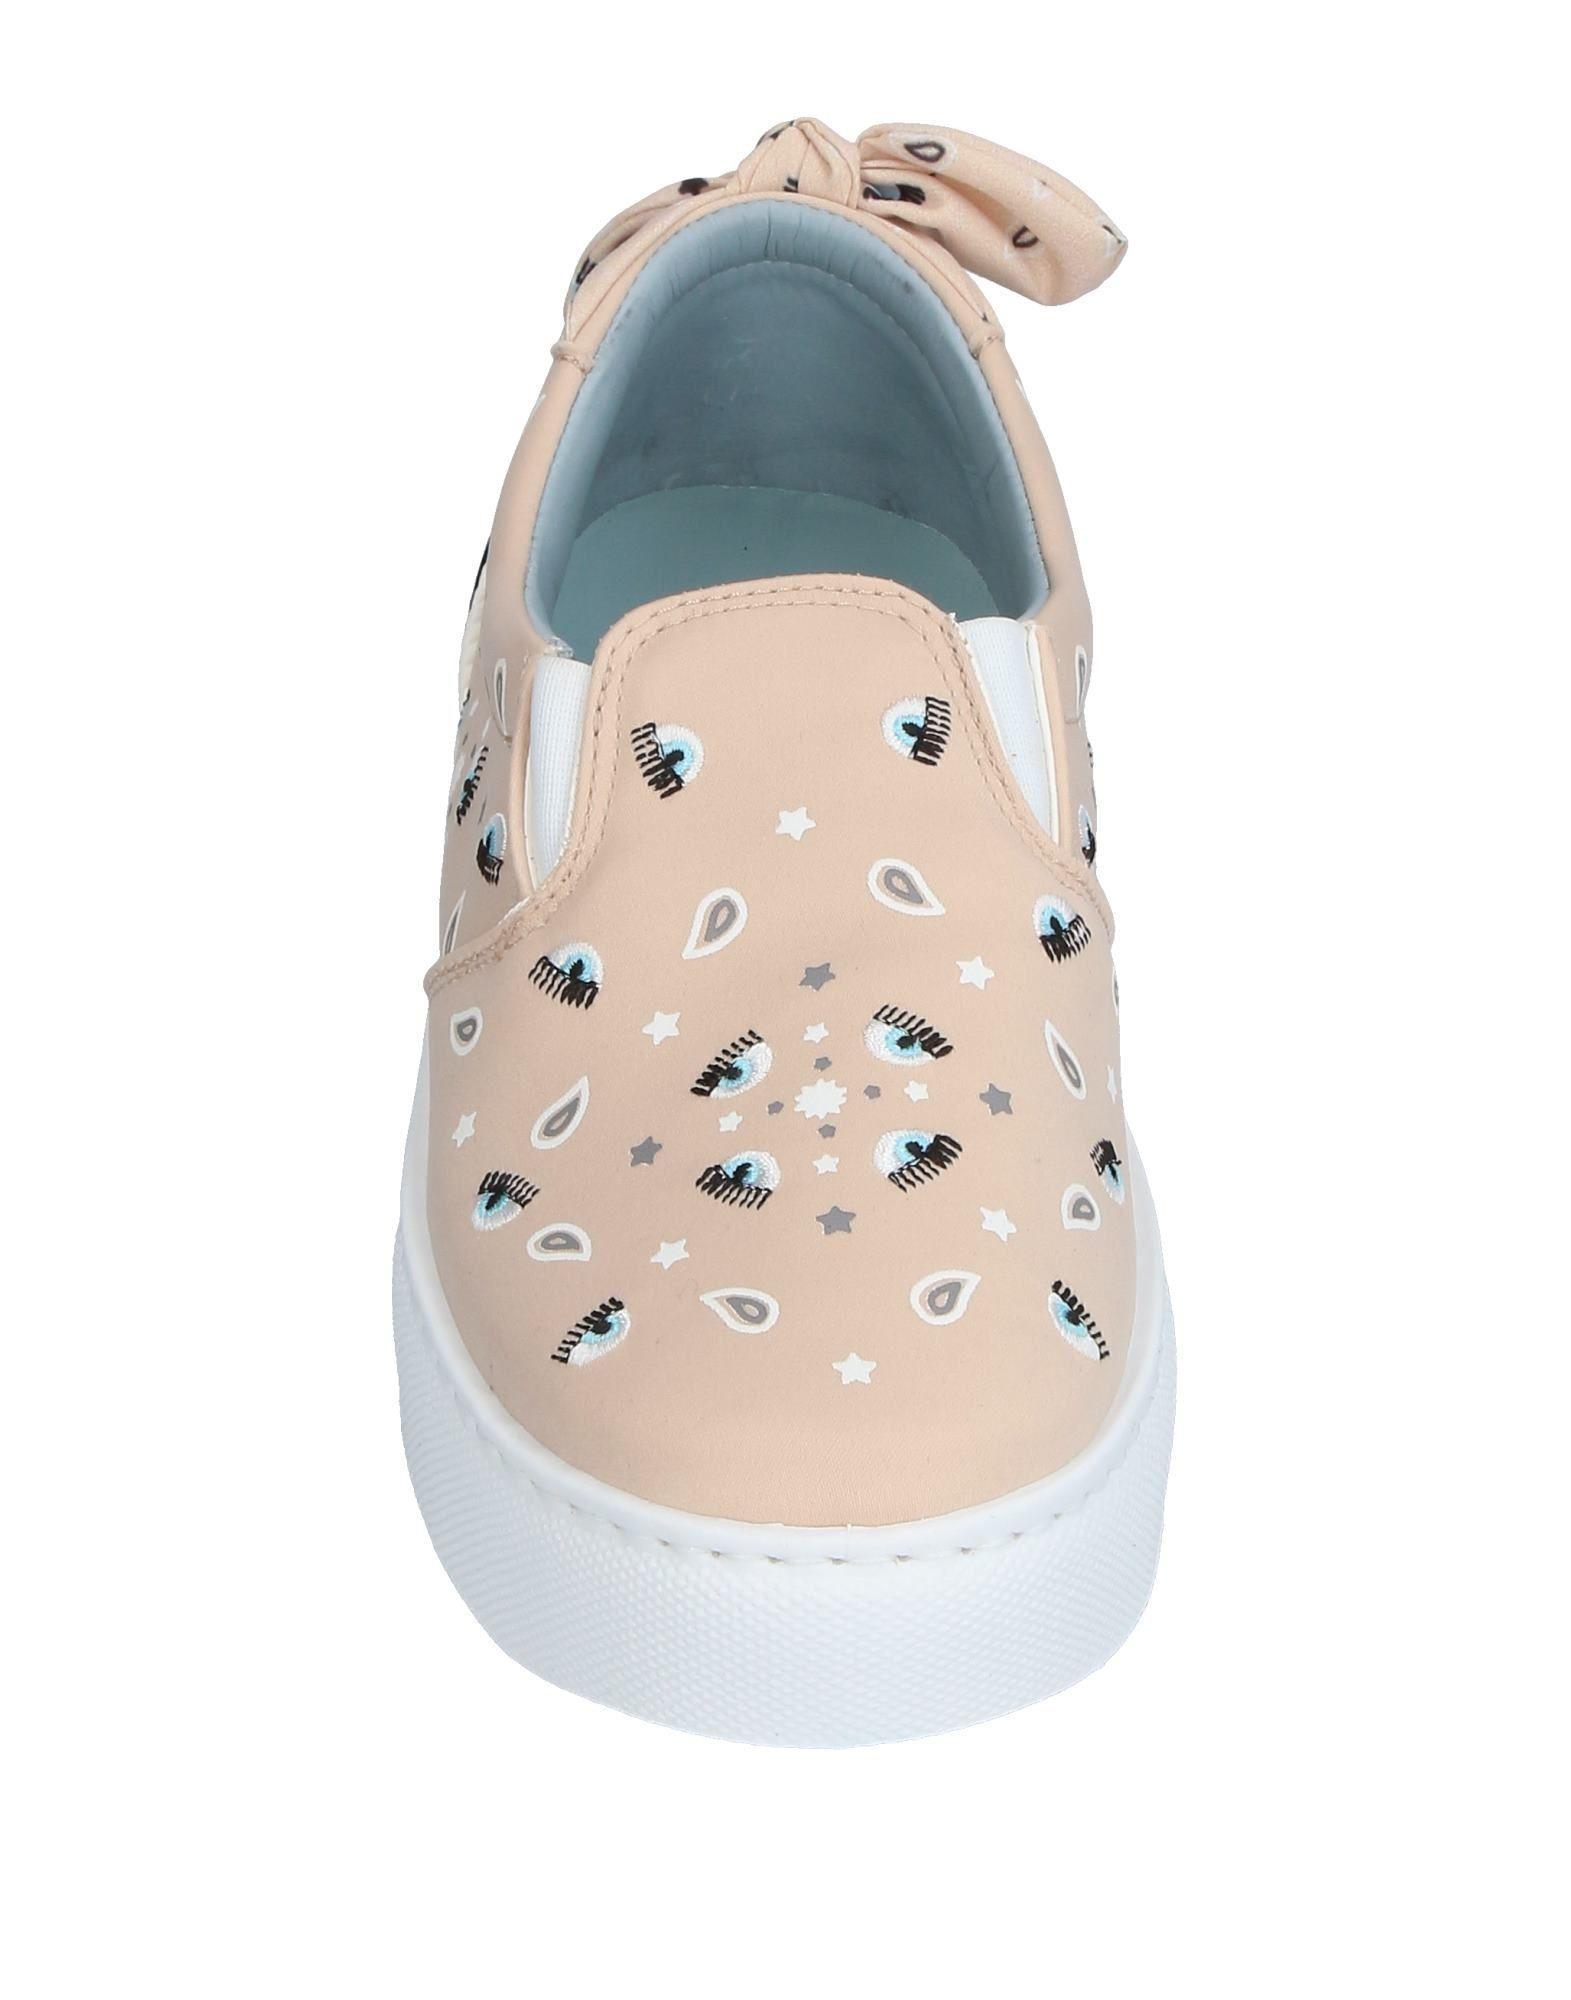 Chiara Ferragni Satin Low-tops & Sneakers in Beige (Natural)